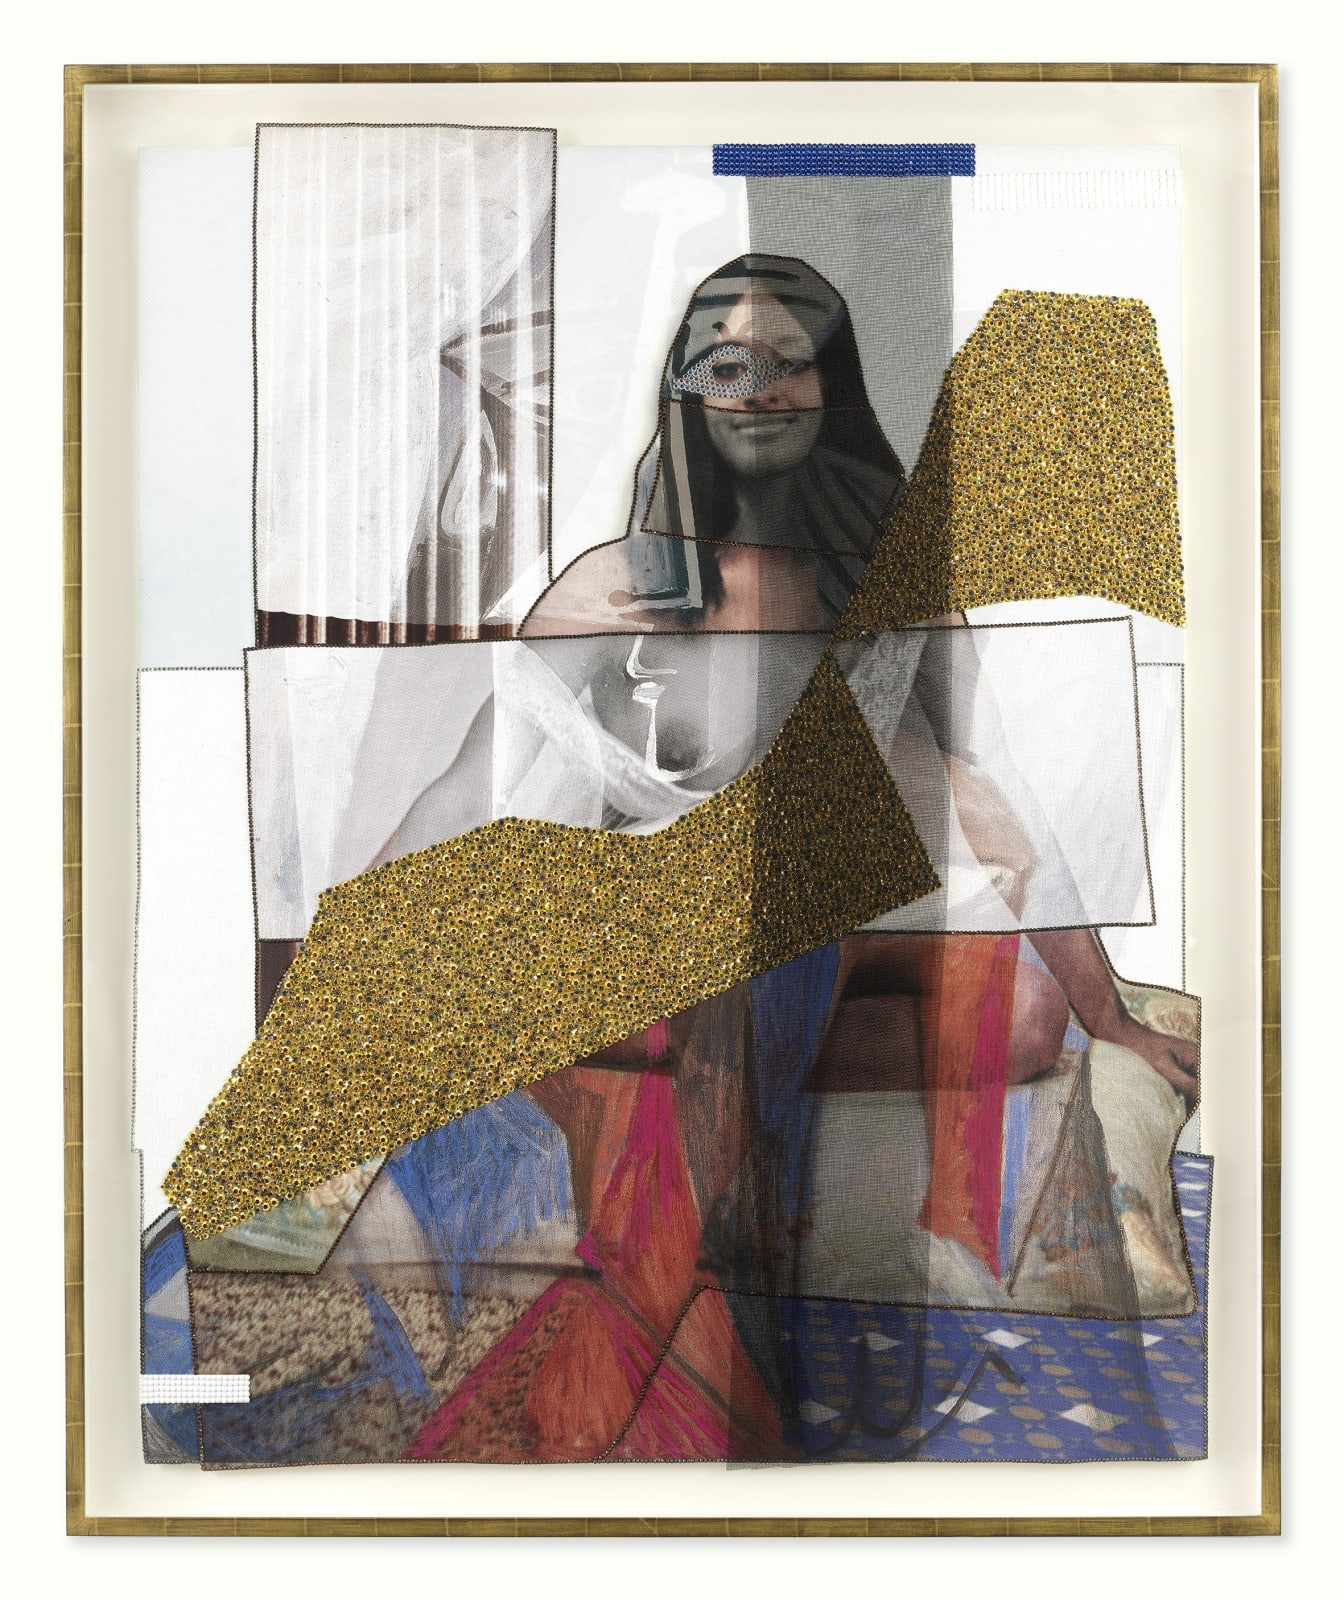 Mickalene Thomas Jet Blue #40, 2021 Color photograph, mixed media paper, acrylic paint, rhinestones, glitter, fiberglass mesh on museum paper mounted on dibond 67 1/8 x 55 3/8 inches - 170,5 x 140,7 cm